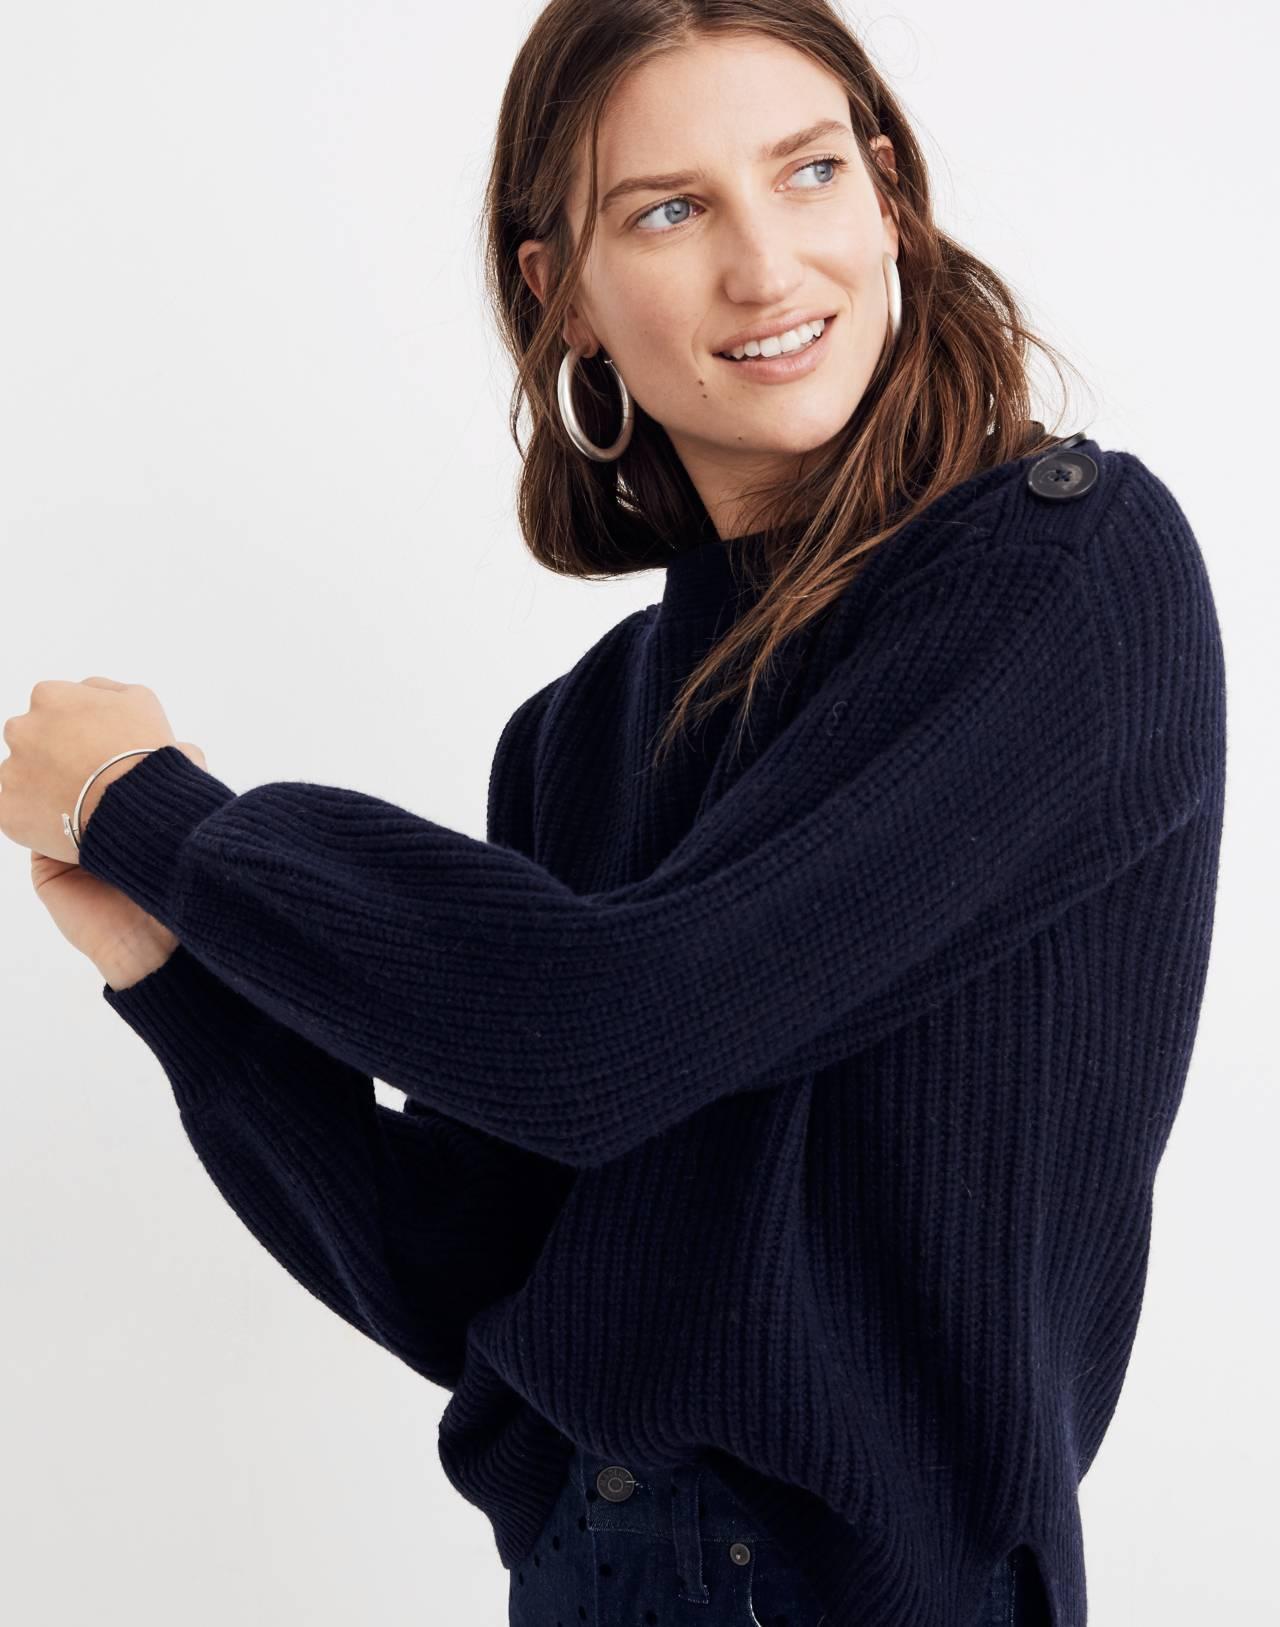 Boatneck Button-Shoulder Sweater in navy image 2